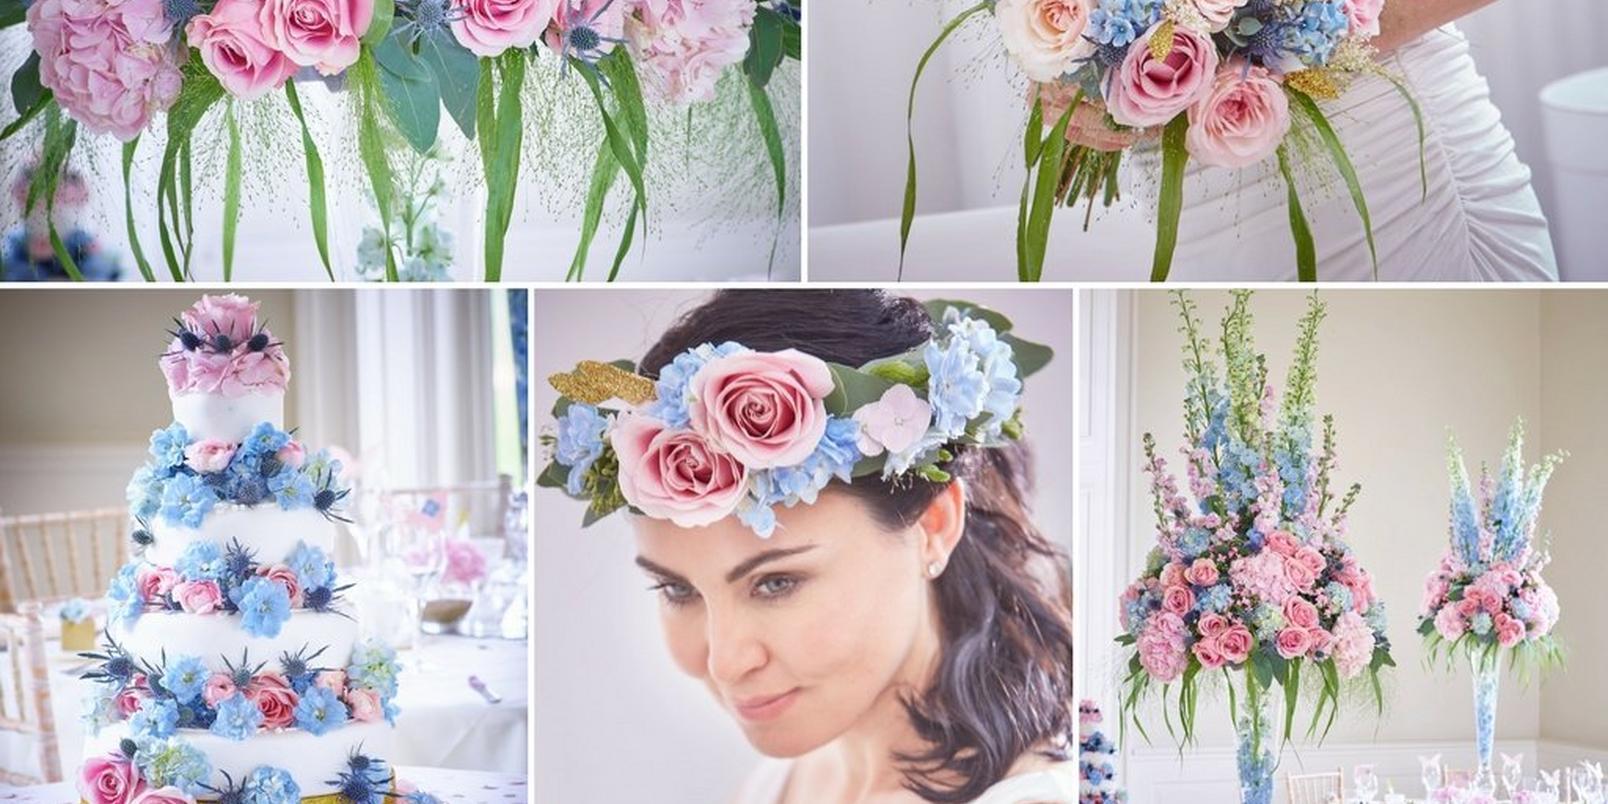 2_Untitled-design-4-summer-wedding-ideas